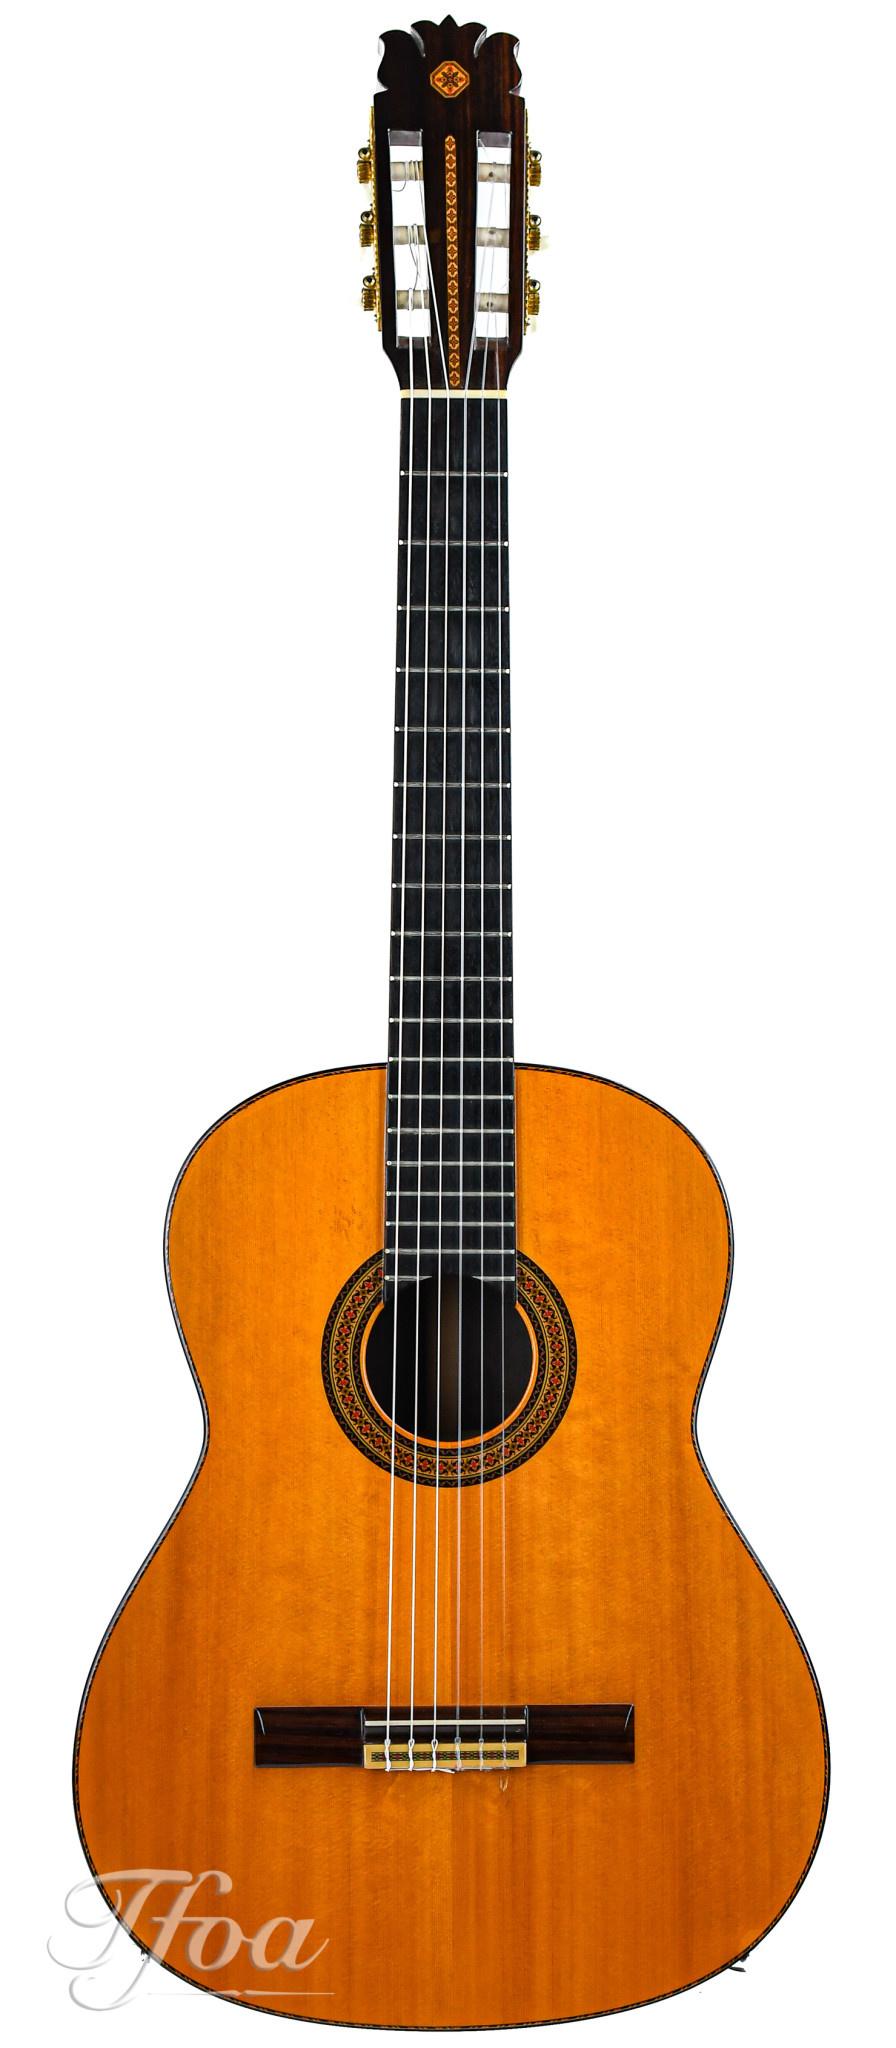 Bozo B3 1970s